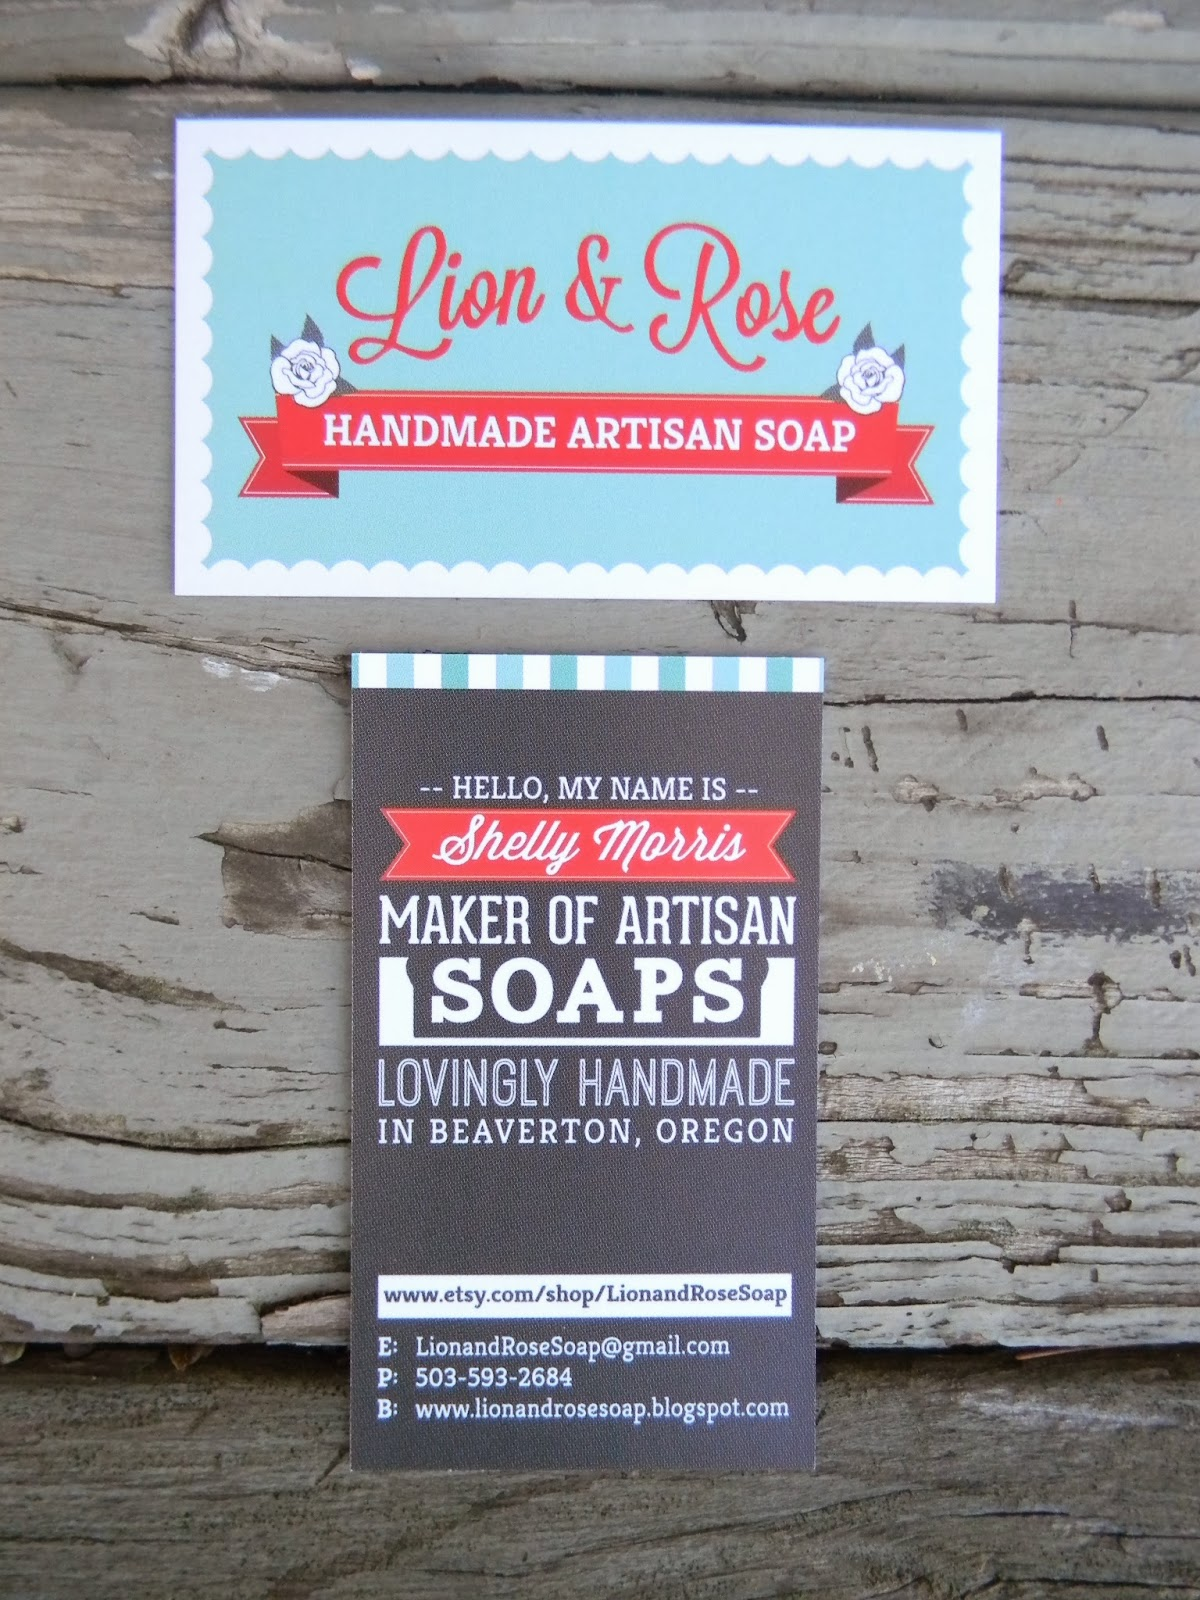 Lion & Rose Handmade Soap Blog: New Business Card!